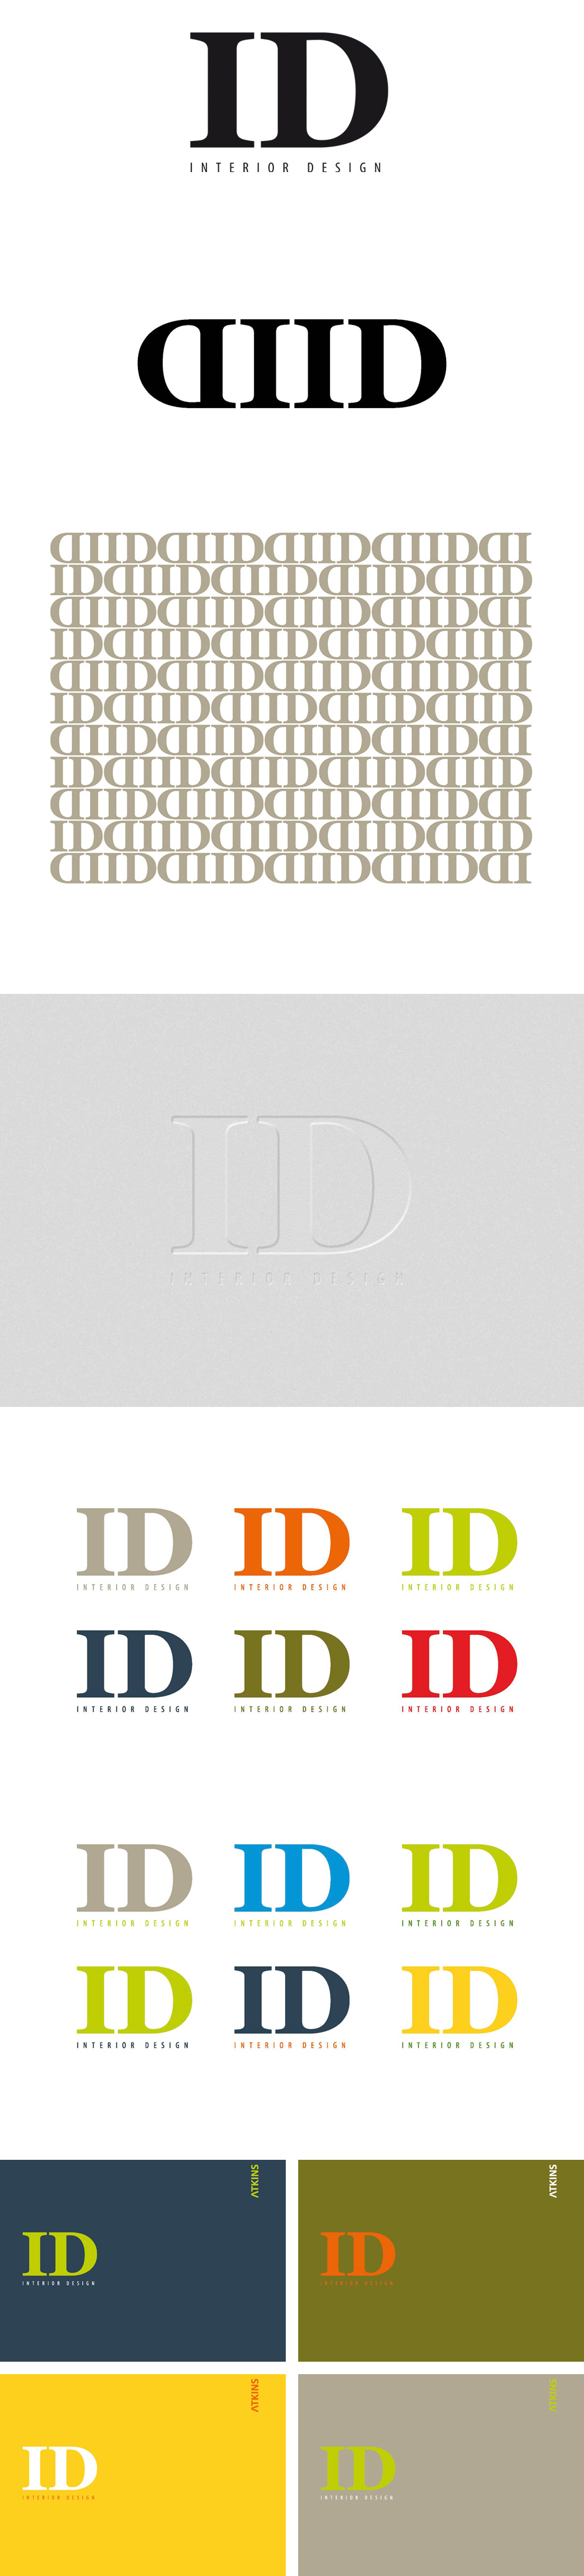 ID_logo_branding